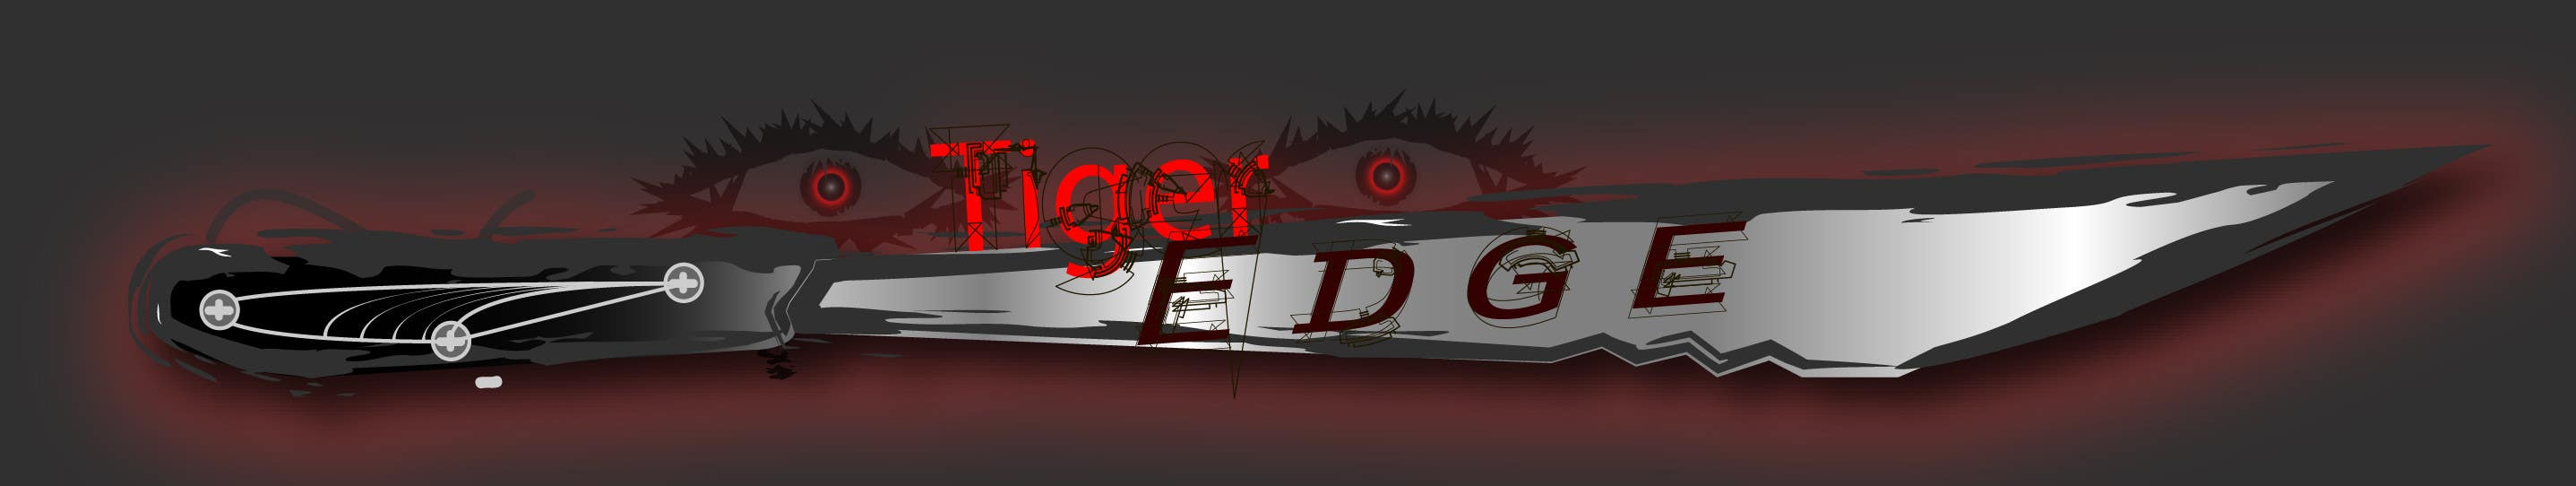 Bài tham dự cuộc thi #83 cho Simple Graphic Design for Tiger Edge